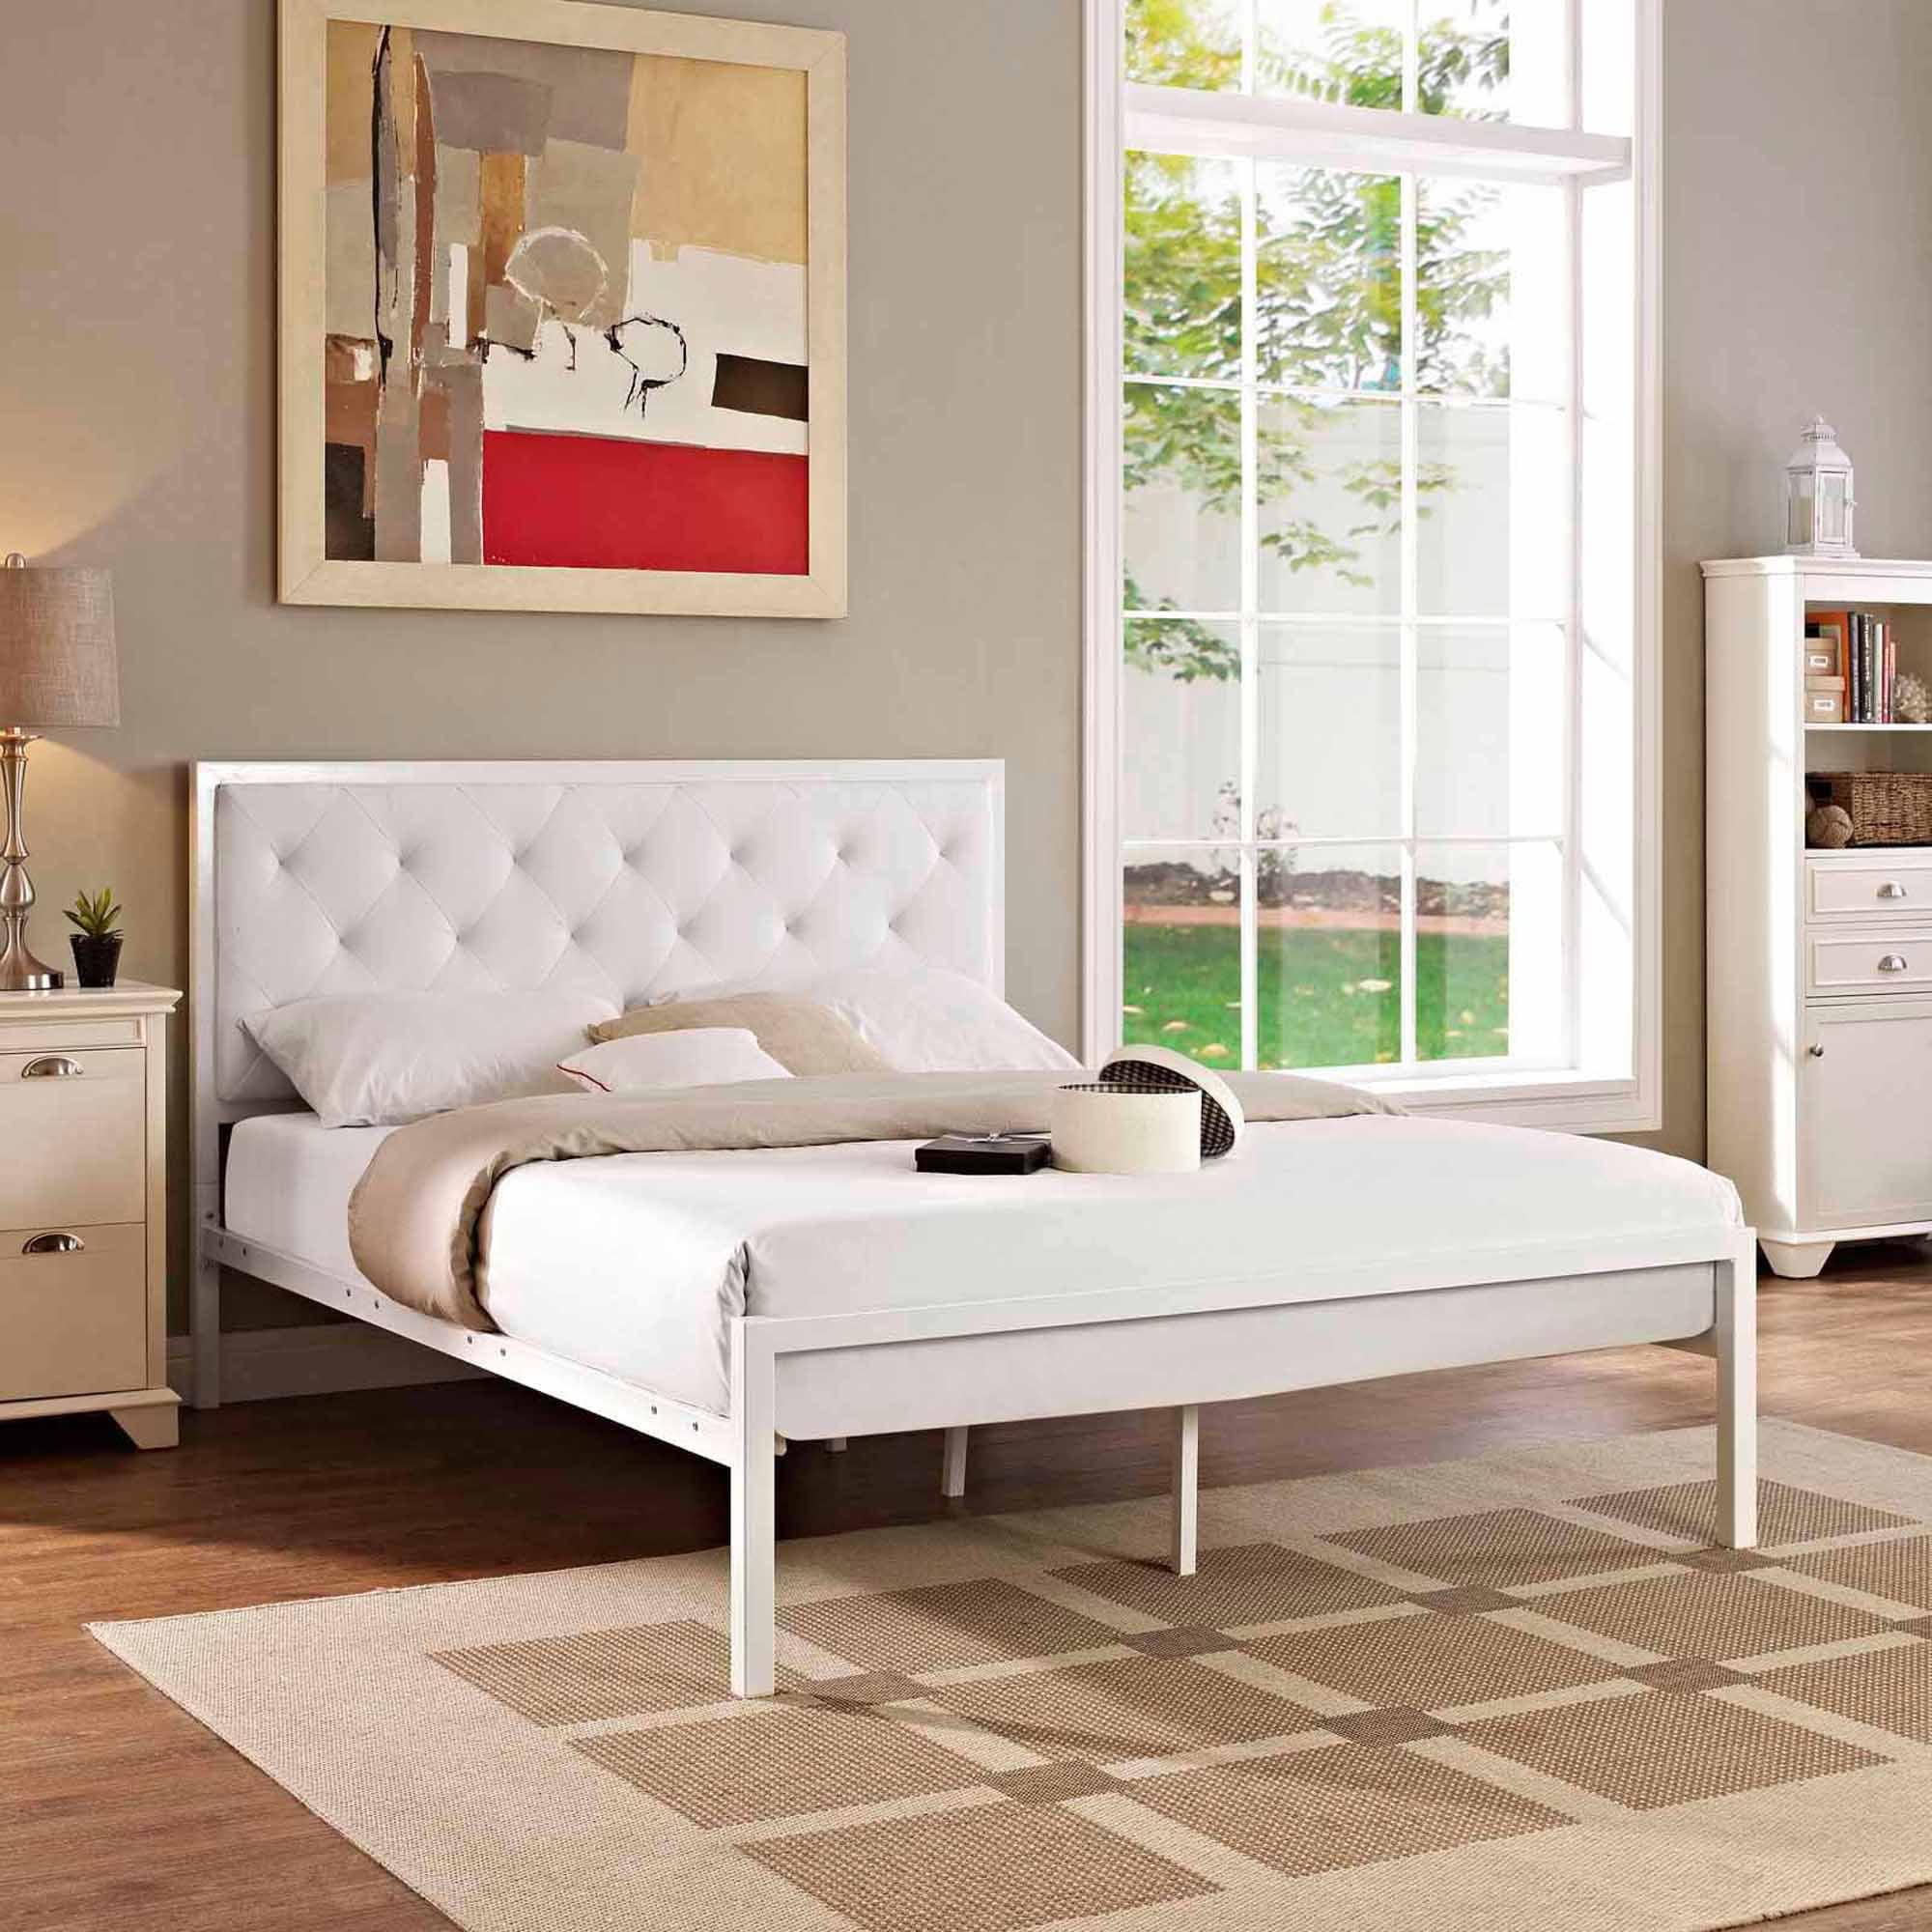 Platform bed frame white - Modway Mia Queen Leatherette Platform Bed Multiple Colors Walmart Com